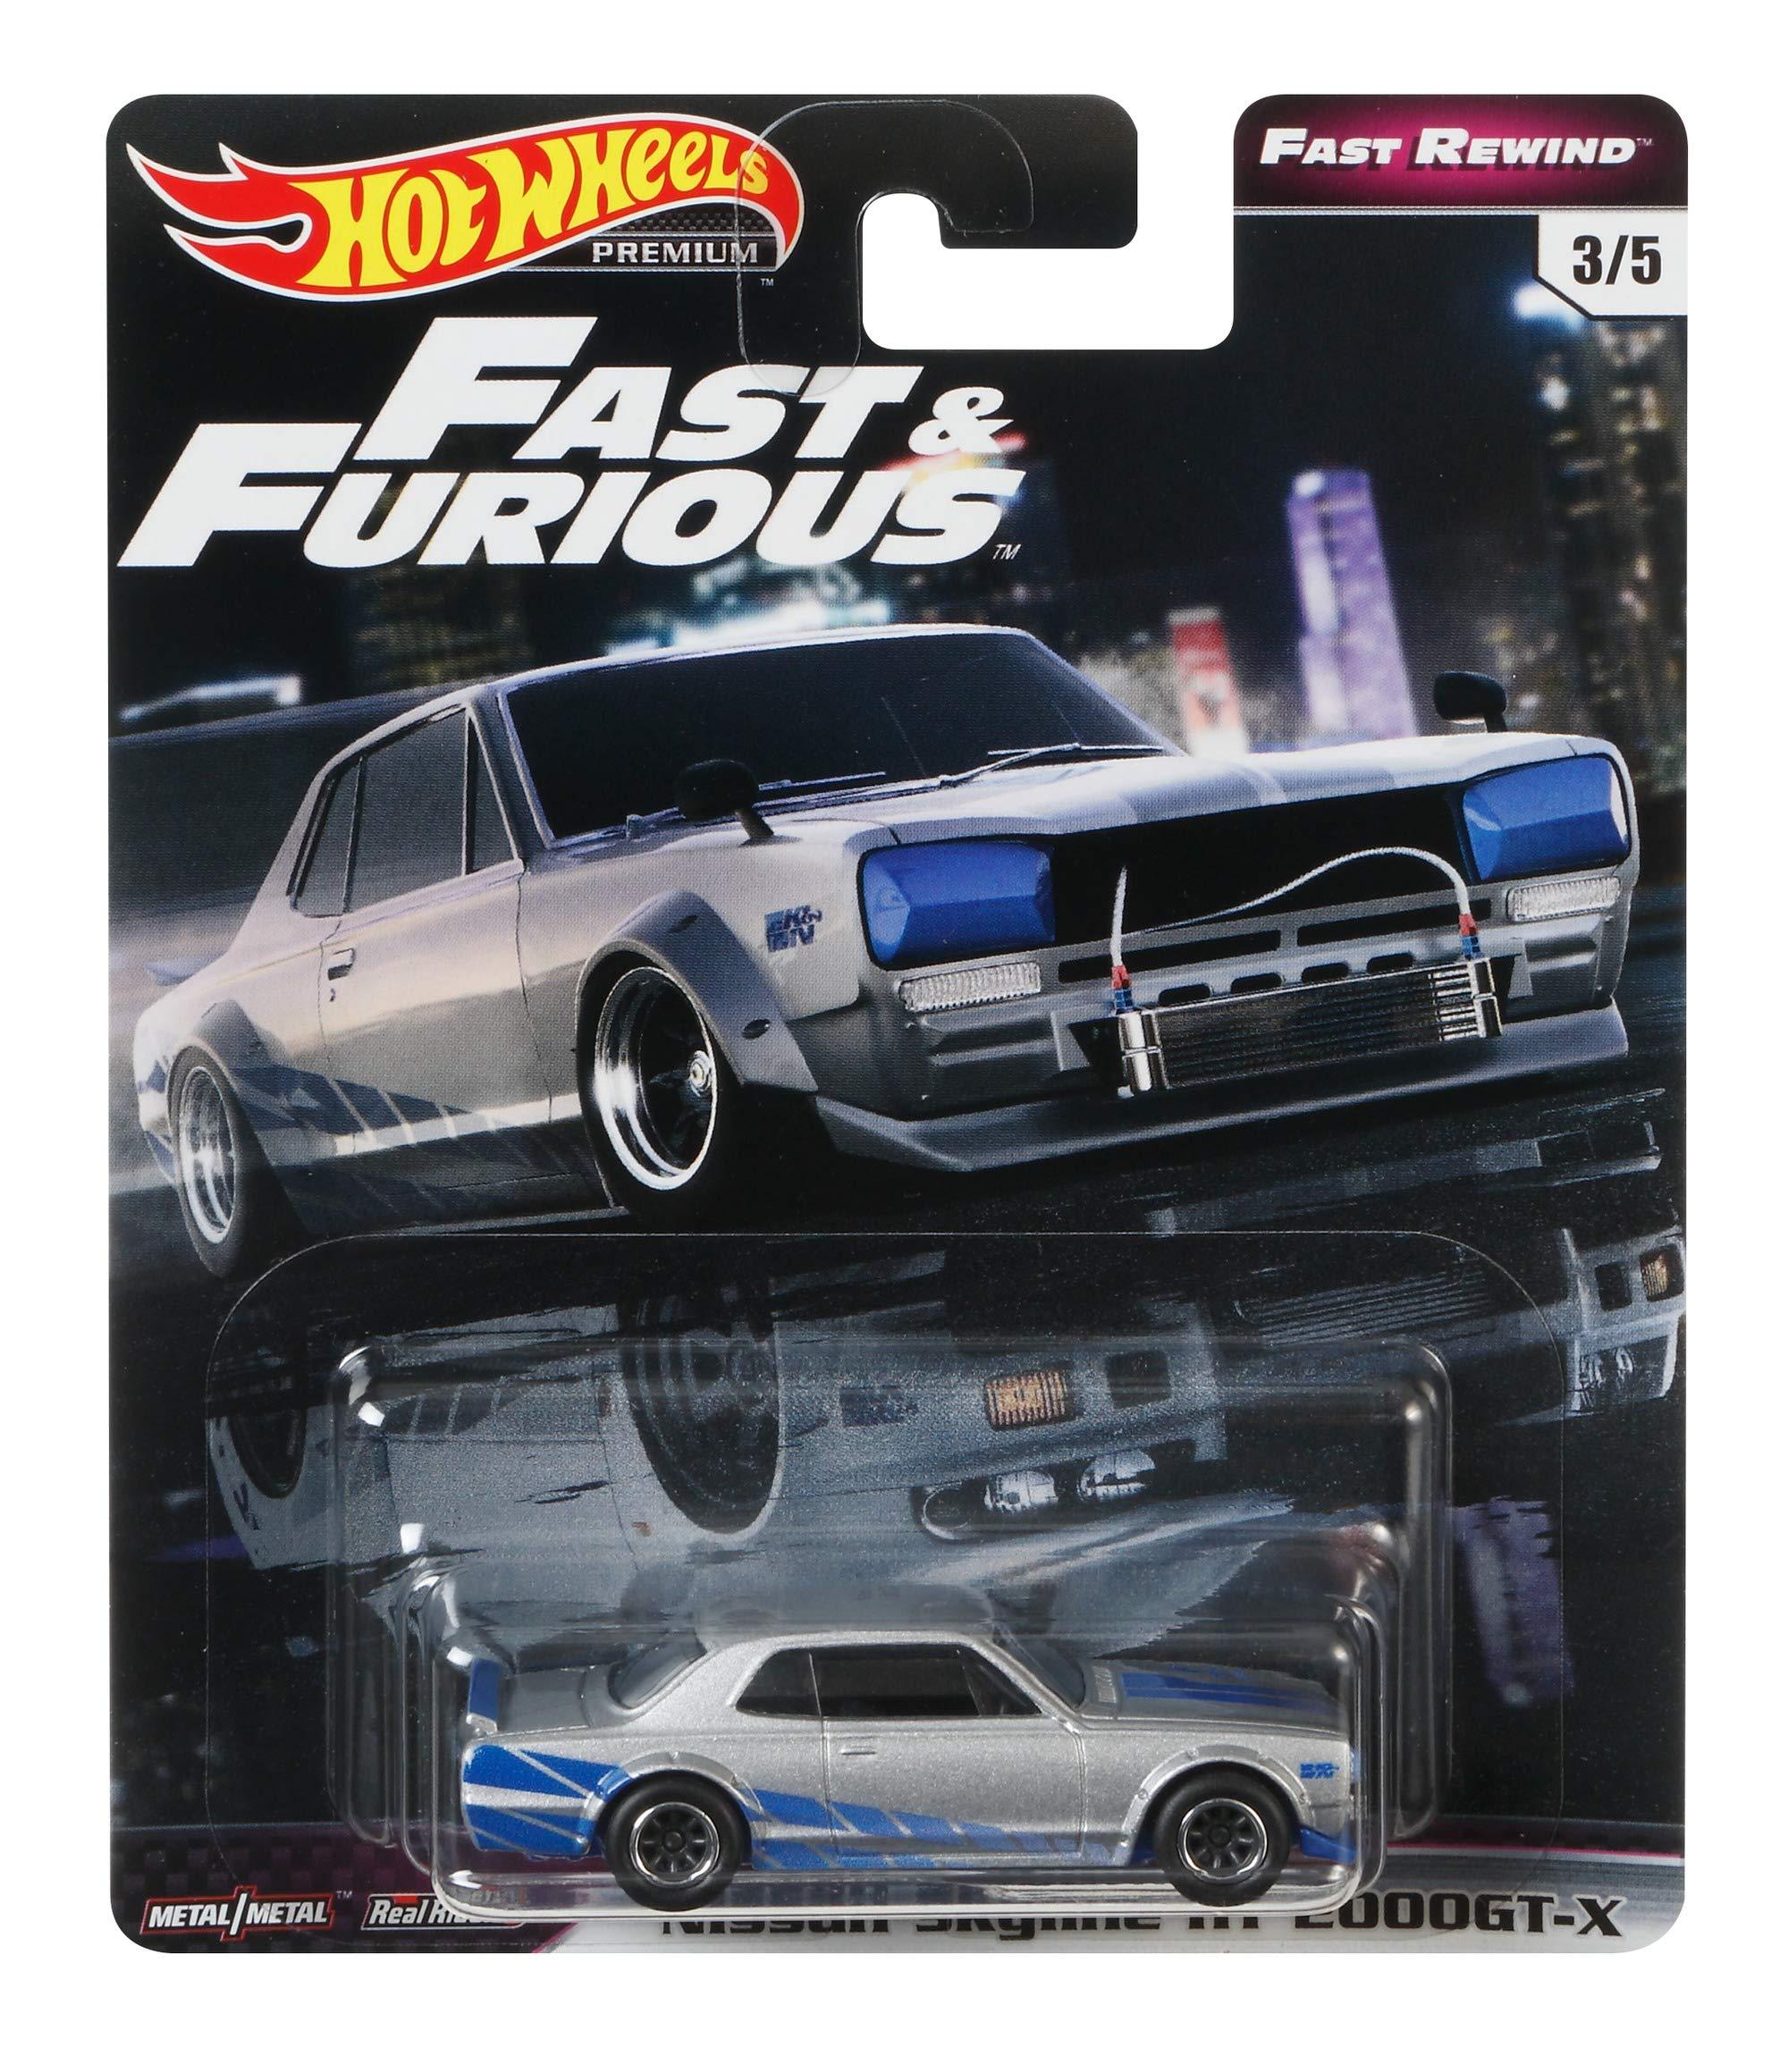 Hot Wheels Fast & Furious Prem Bundle 2 Vehicle